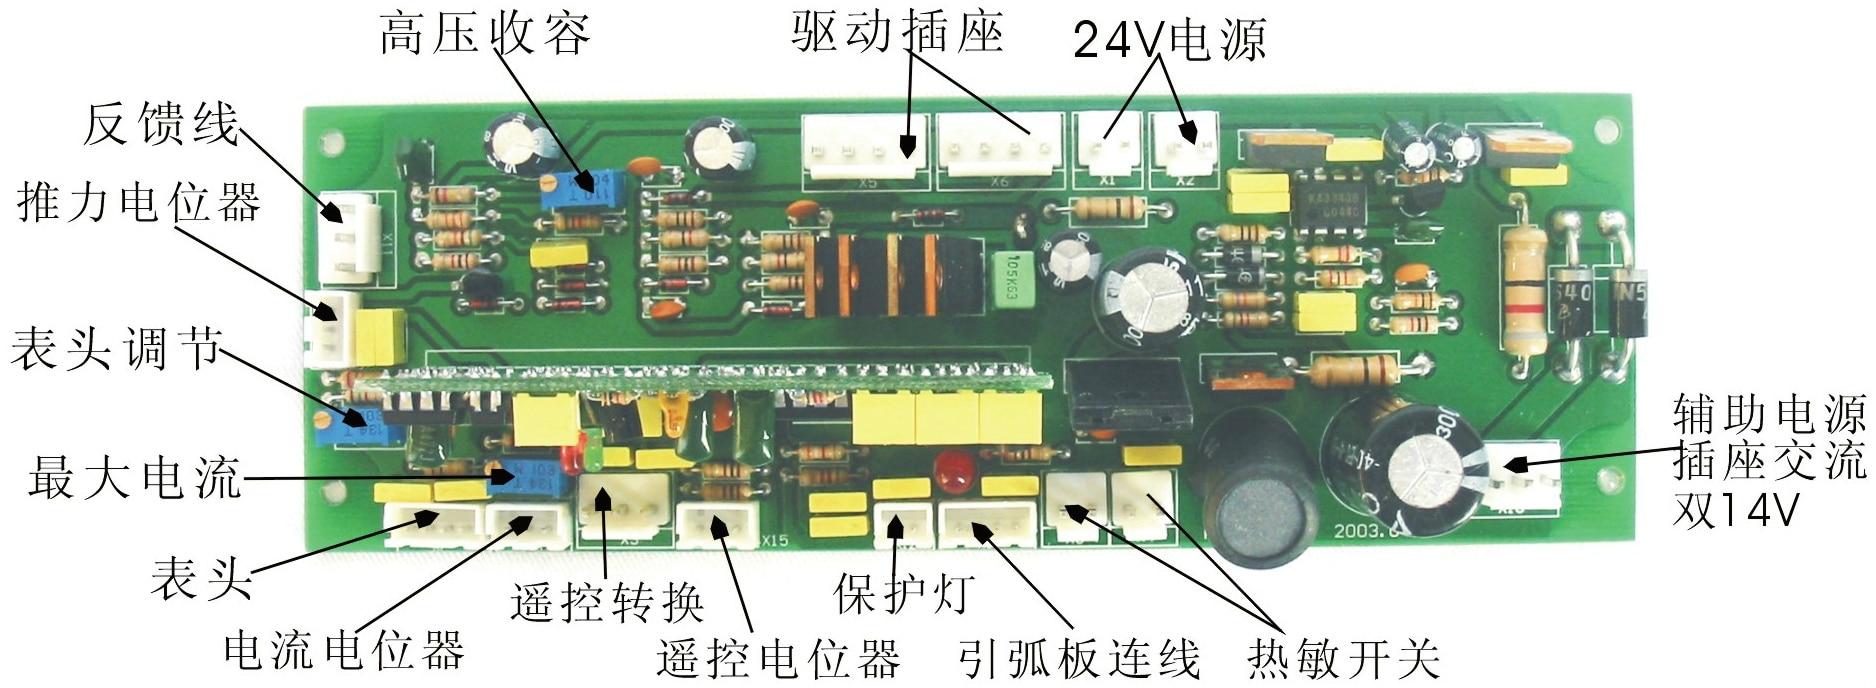 electric welding machine inverter dc manual welding parts zx7 mos inverter welding machine  [ 1876 x 688 Pixel ]